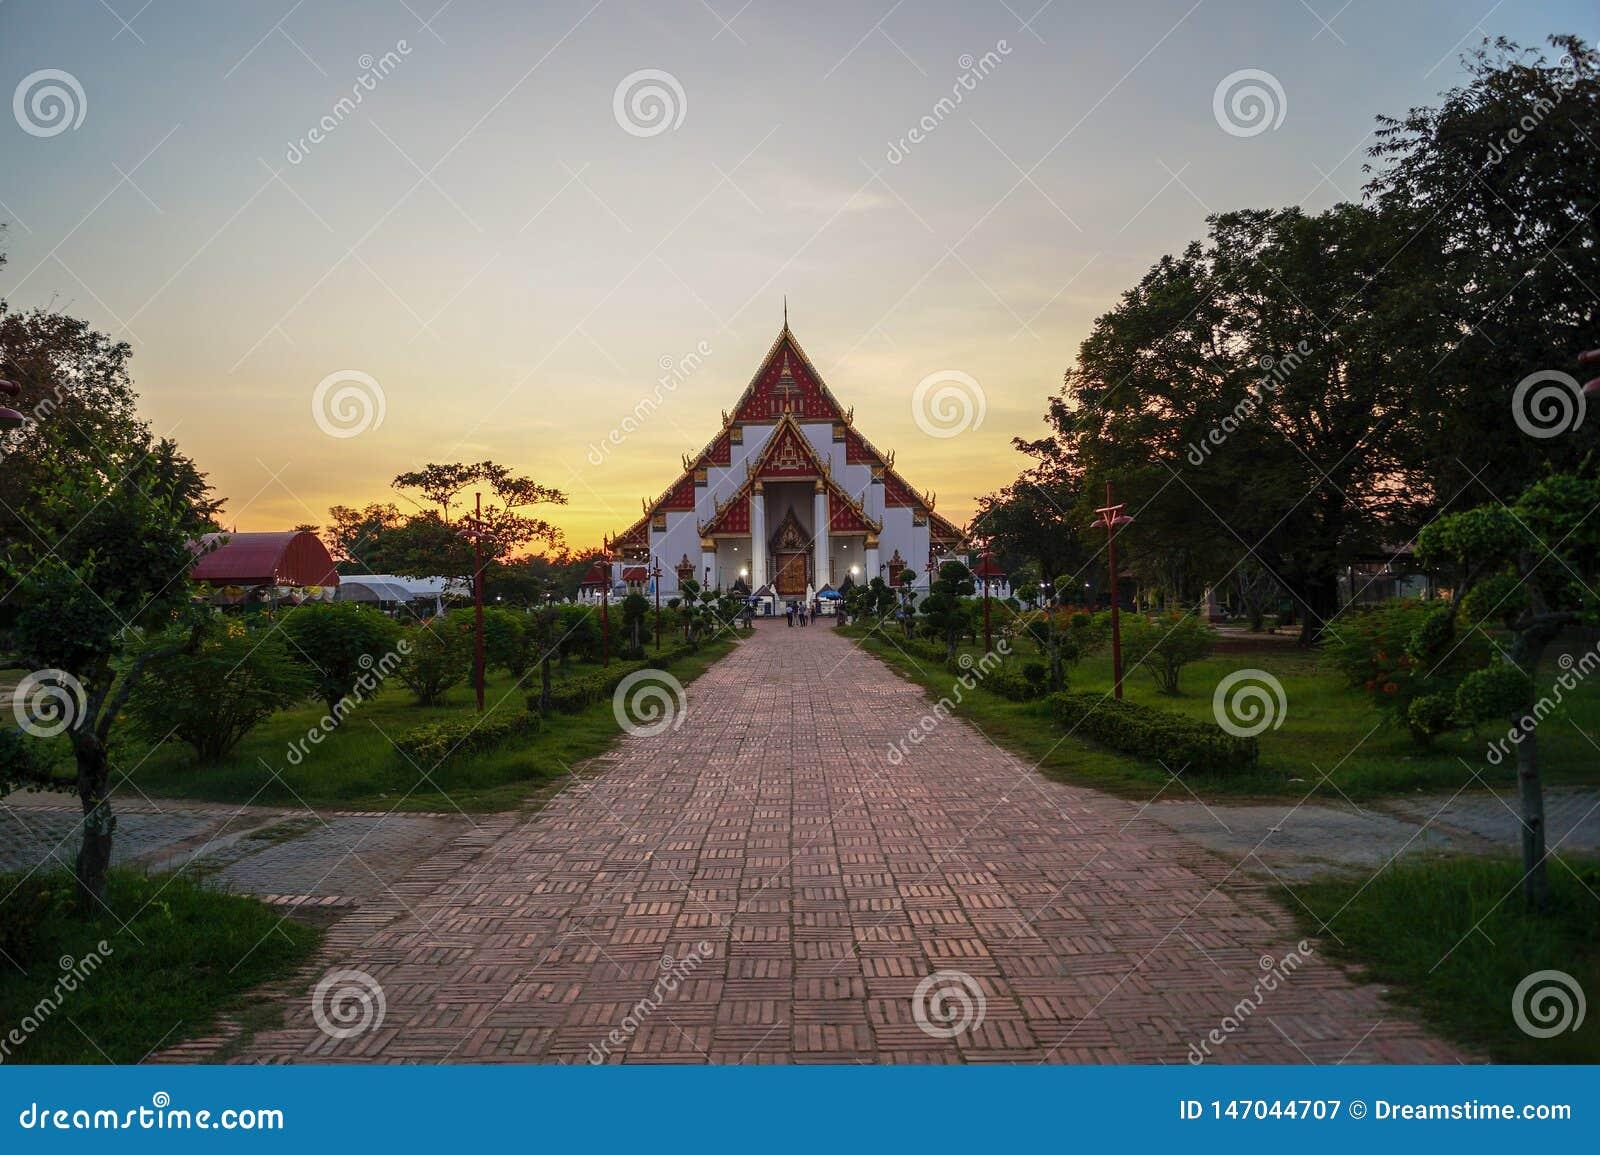 Tempio buddista ad un tramonto dorato in un parco a Ayutthaya, Tailandia